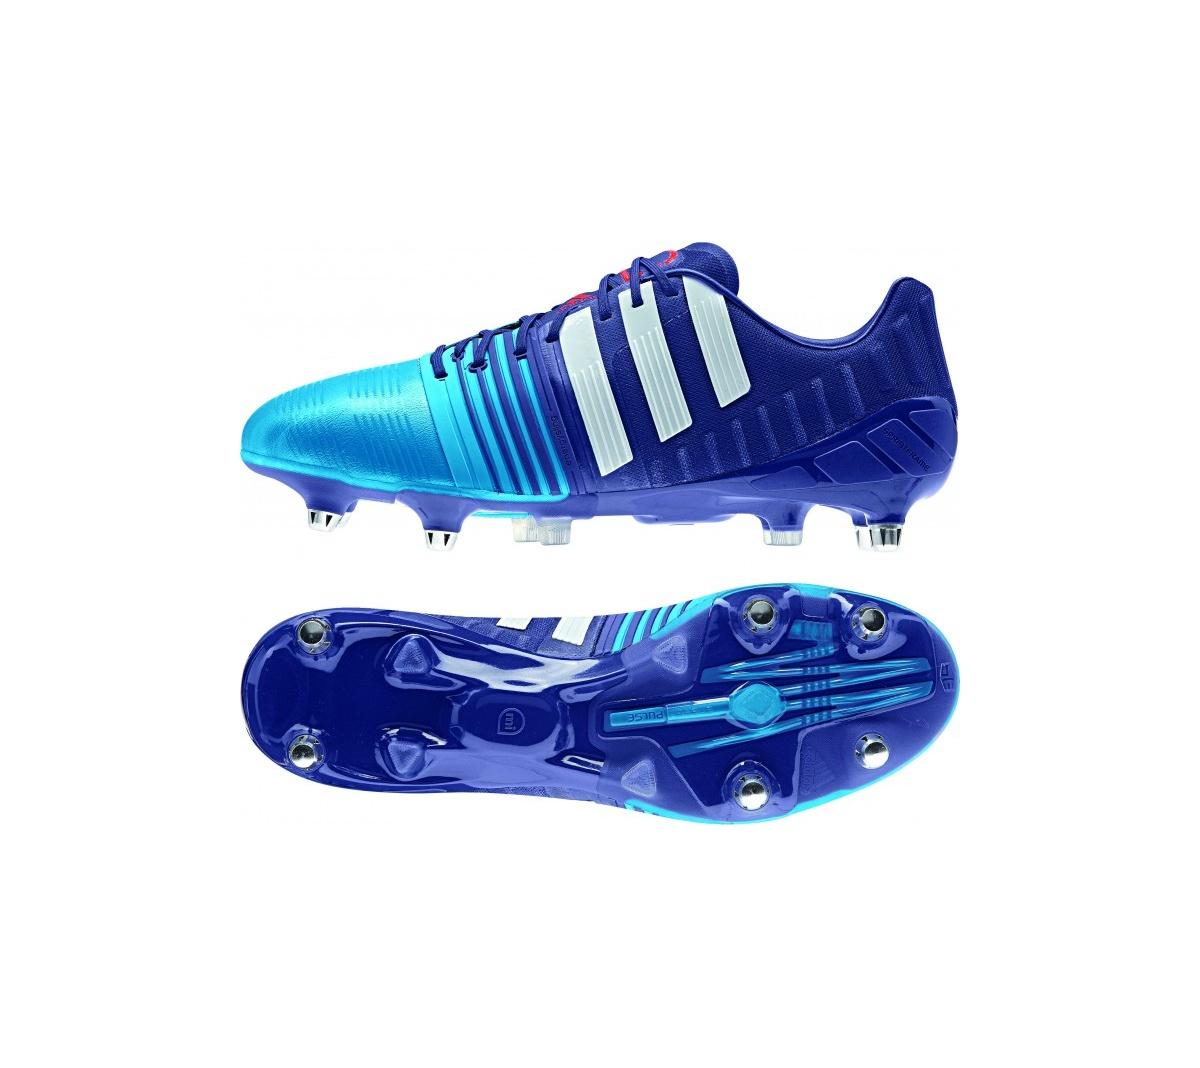 2551d43cd6b0d Chuteira Adidas Nitrocharge 1.0 SG Campo - Mundo do Futebol